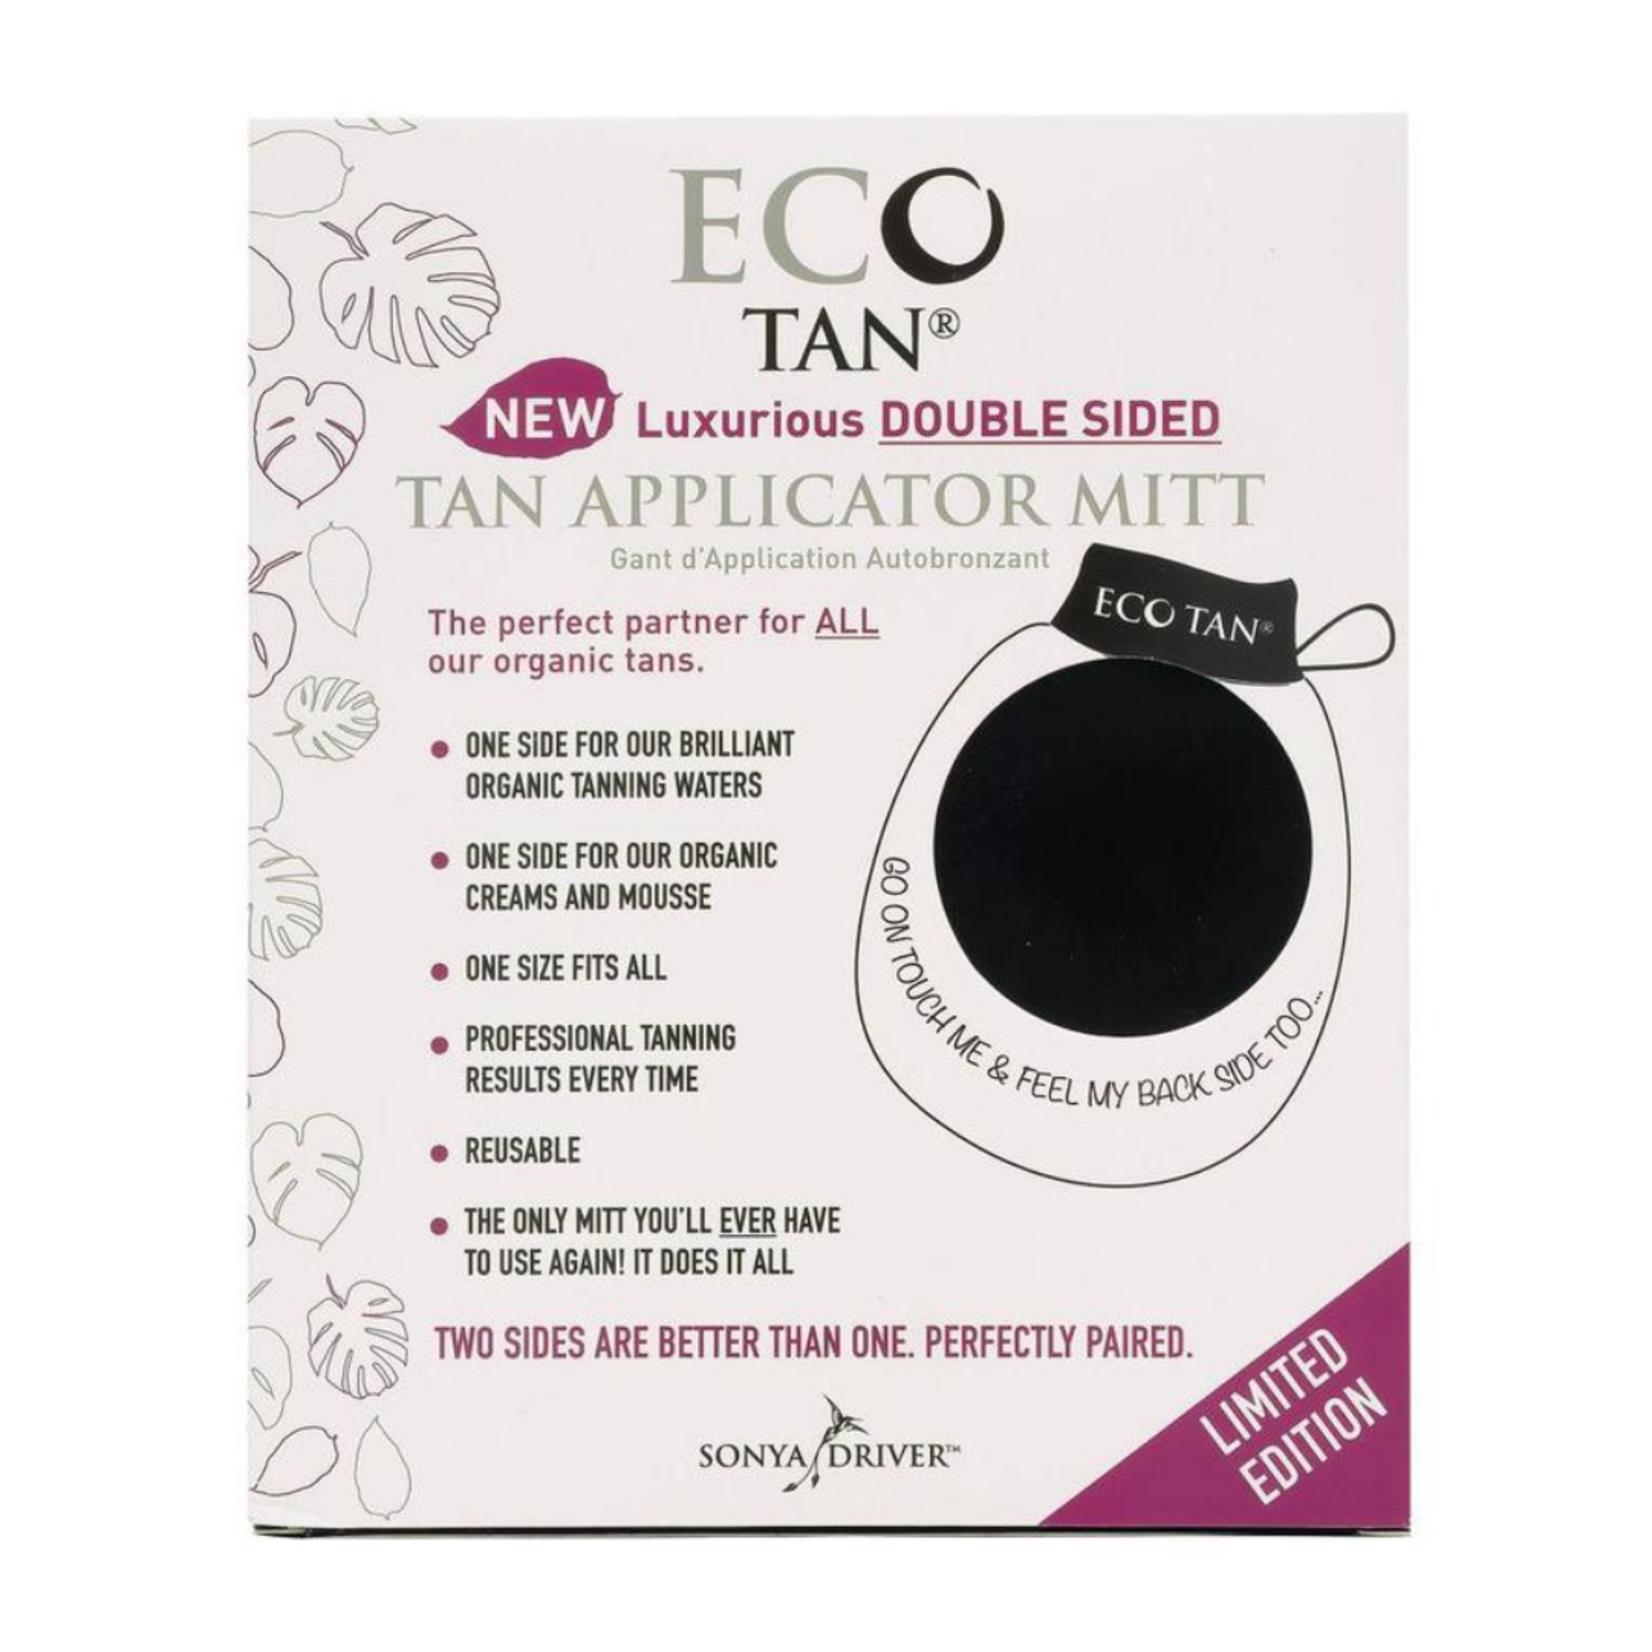 Eco Tan Eco Tan Tan Applicator Mitt